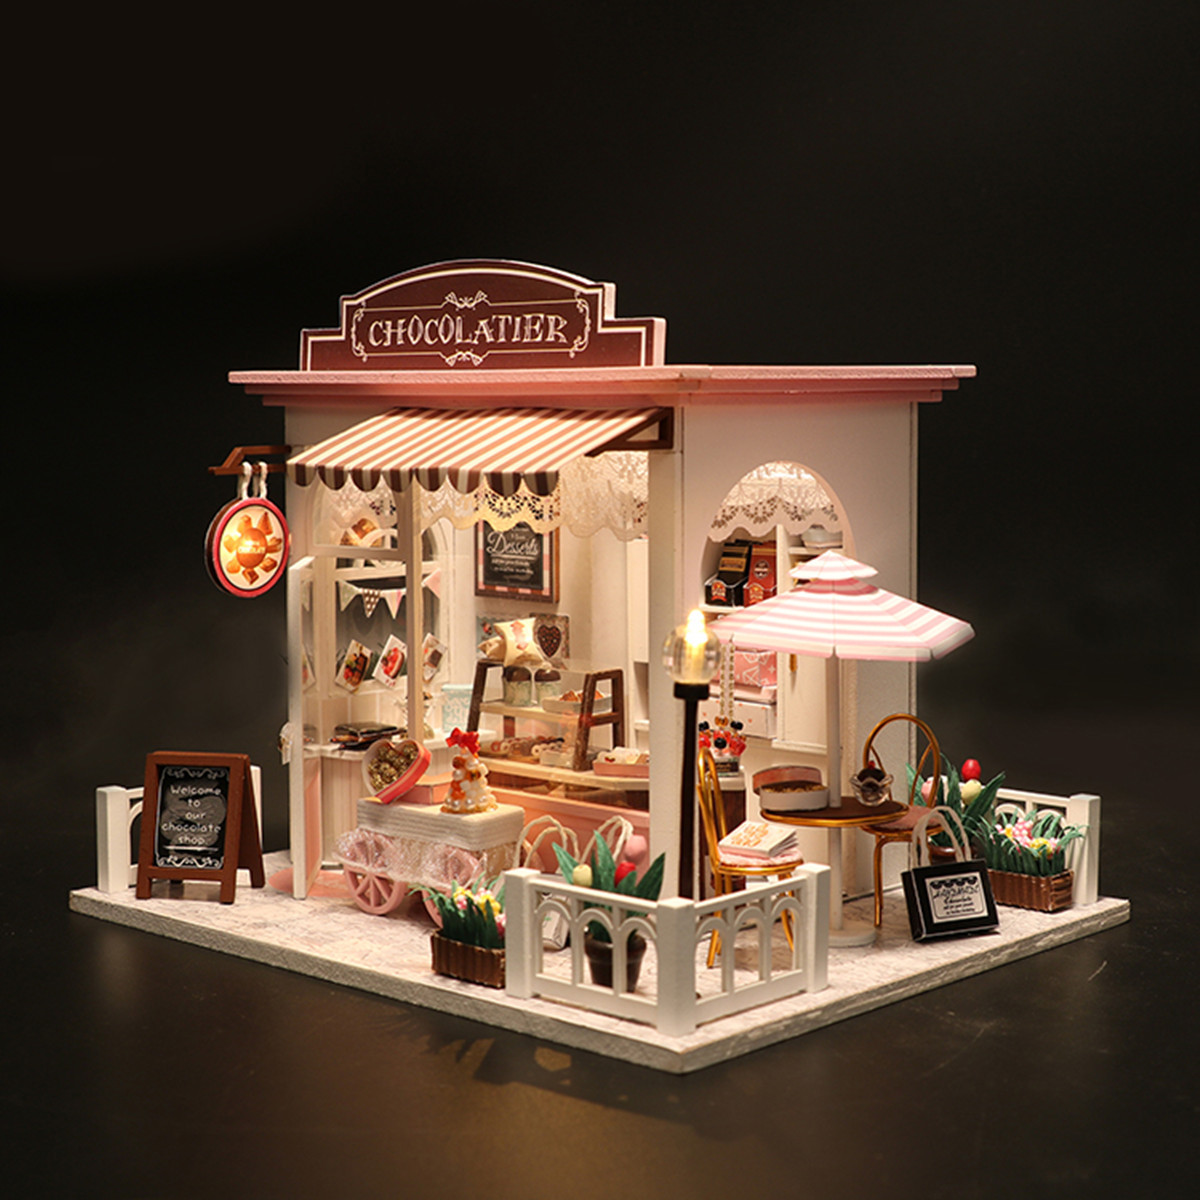 6 Pcs colorful miniature books 1:12 wooden doll house miniature books E Ze